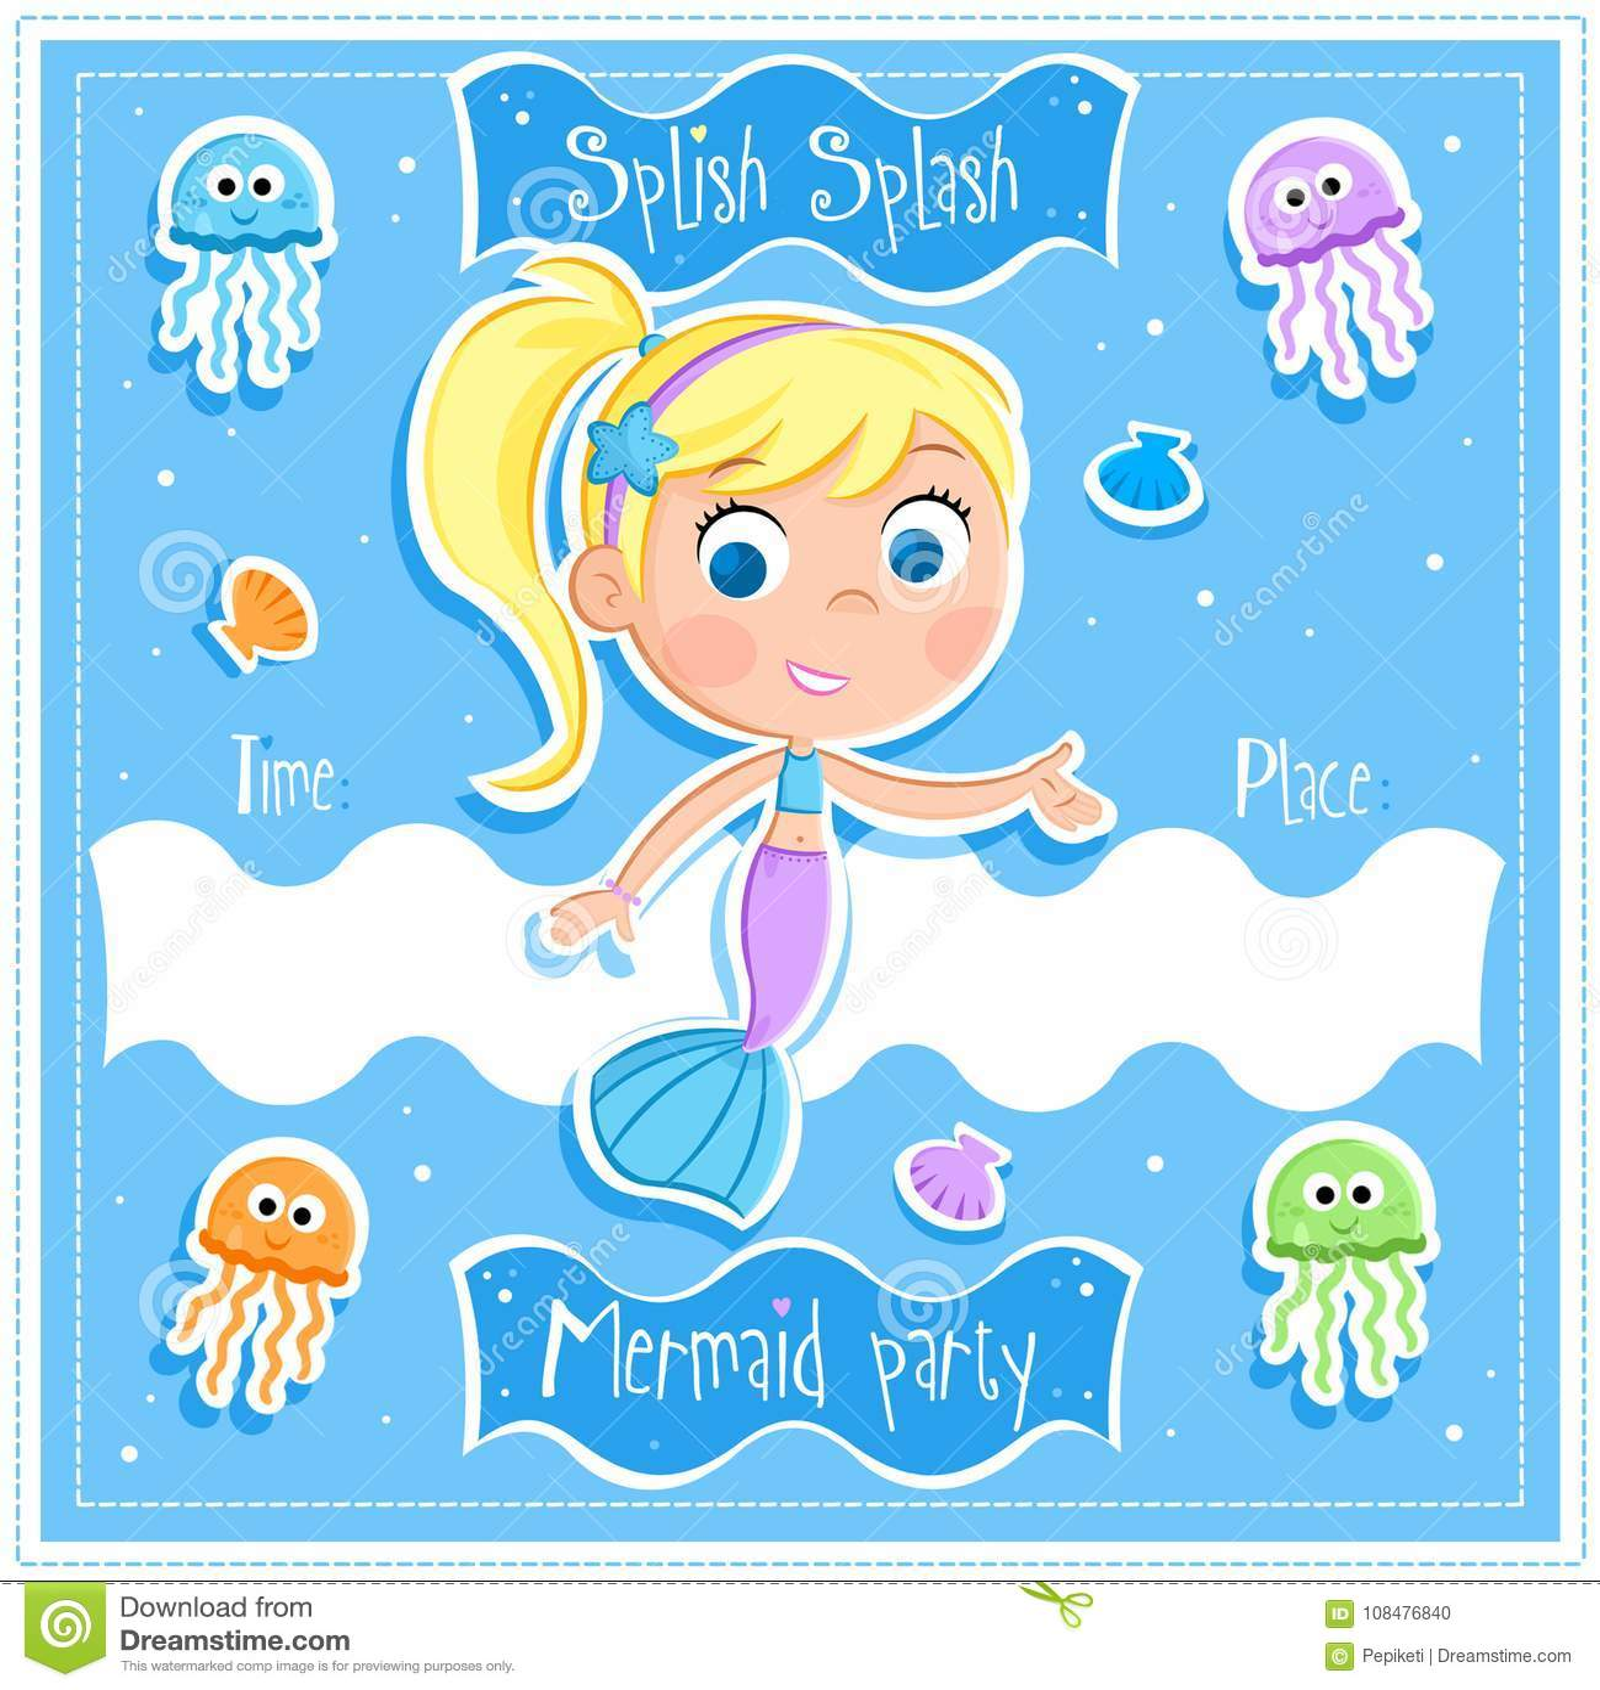 splish splash mermaid party invitation card stock illustration